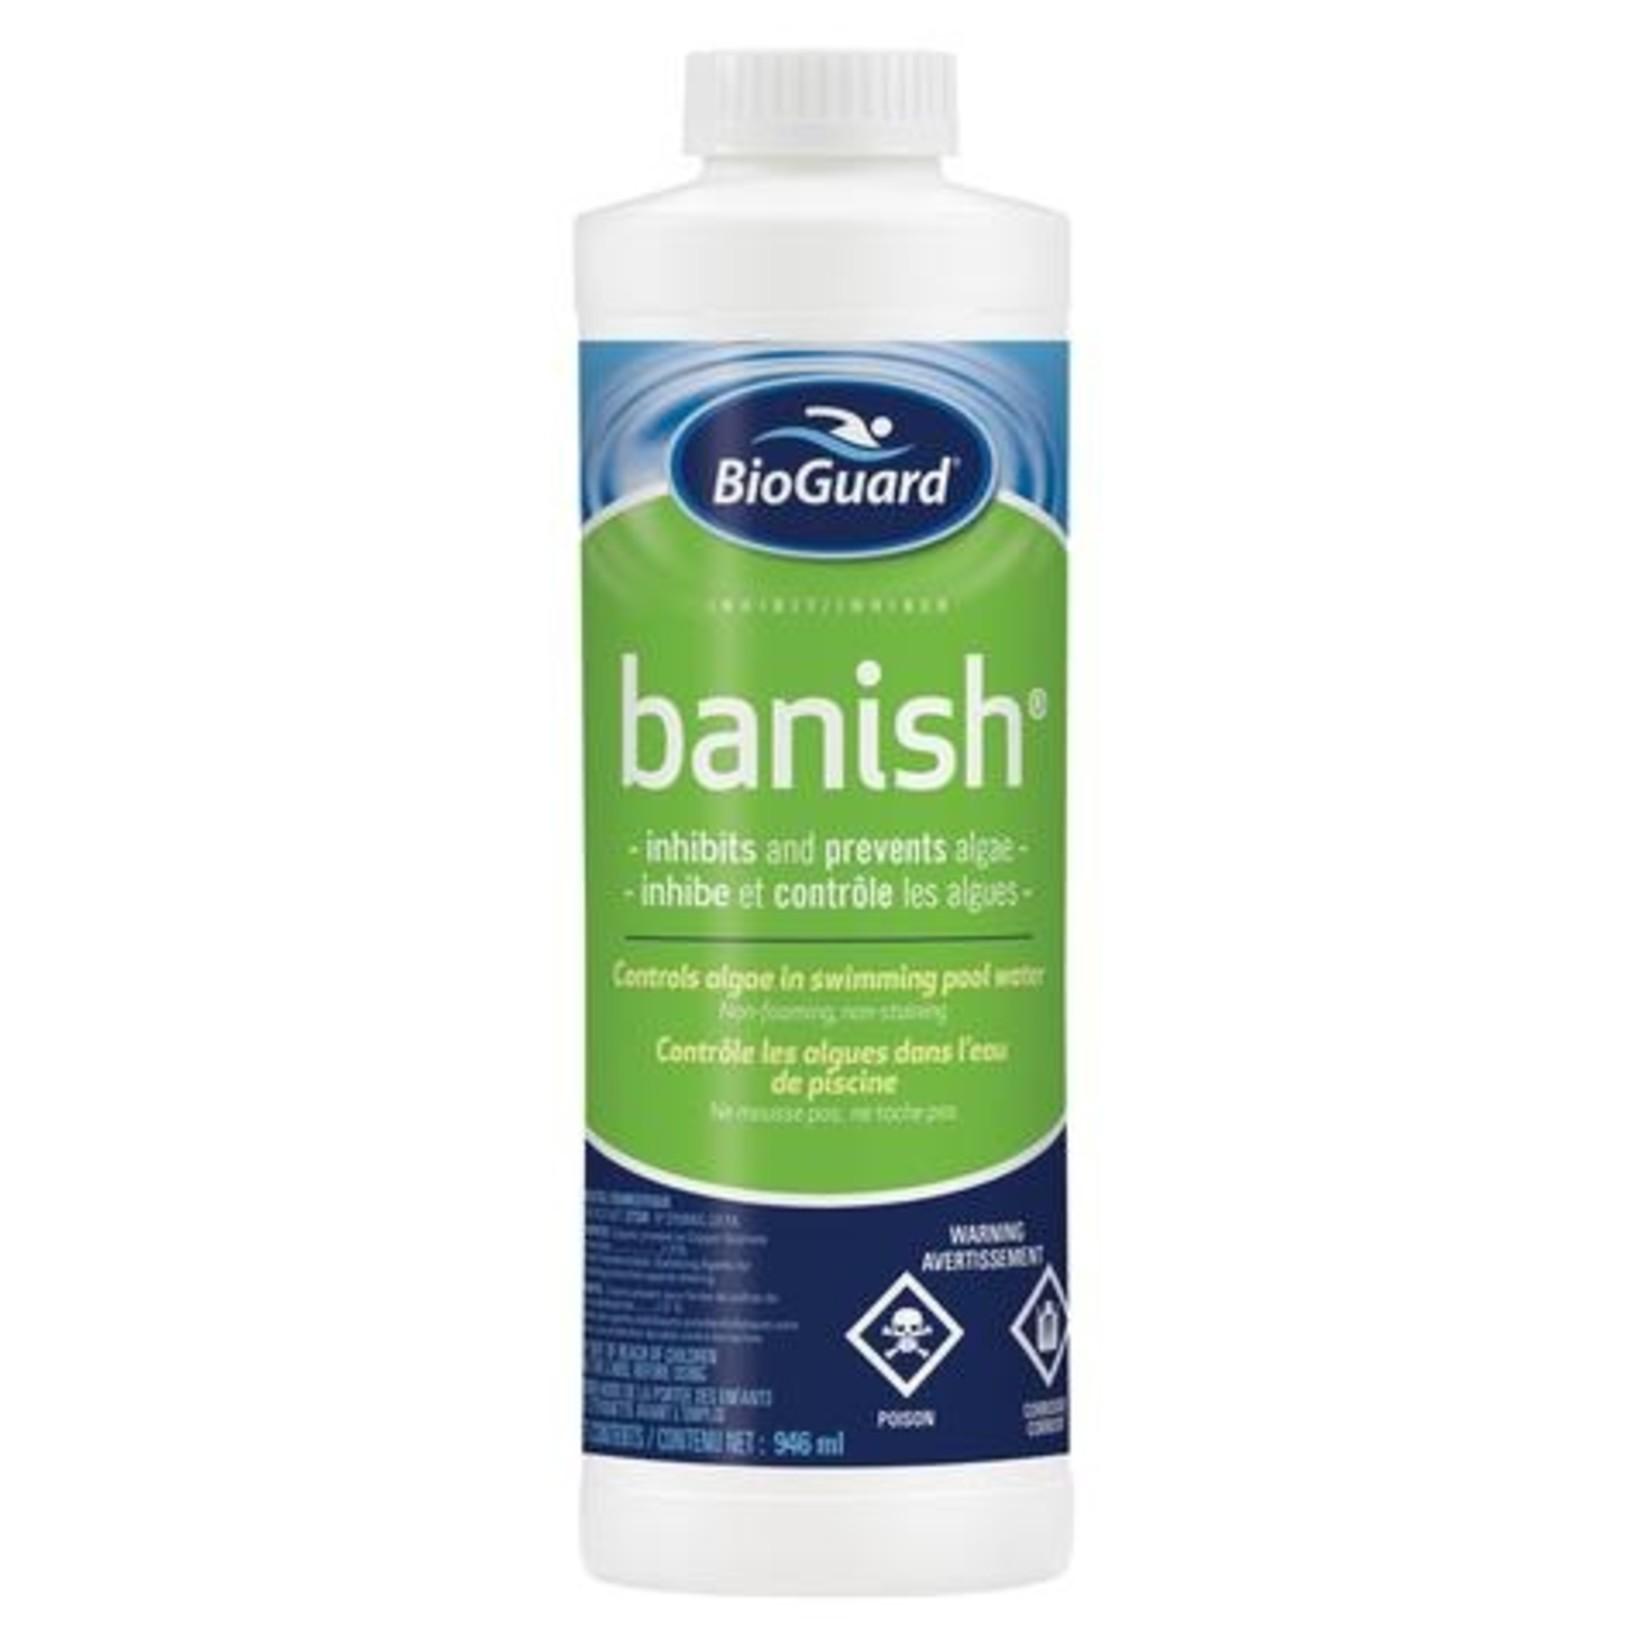 BioGuard Banish® (946 mL)